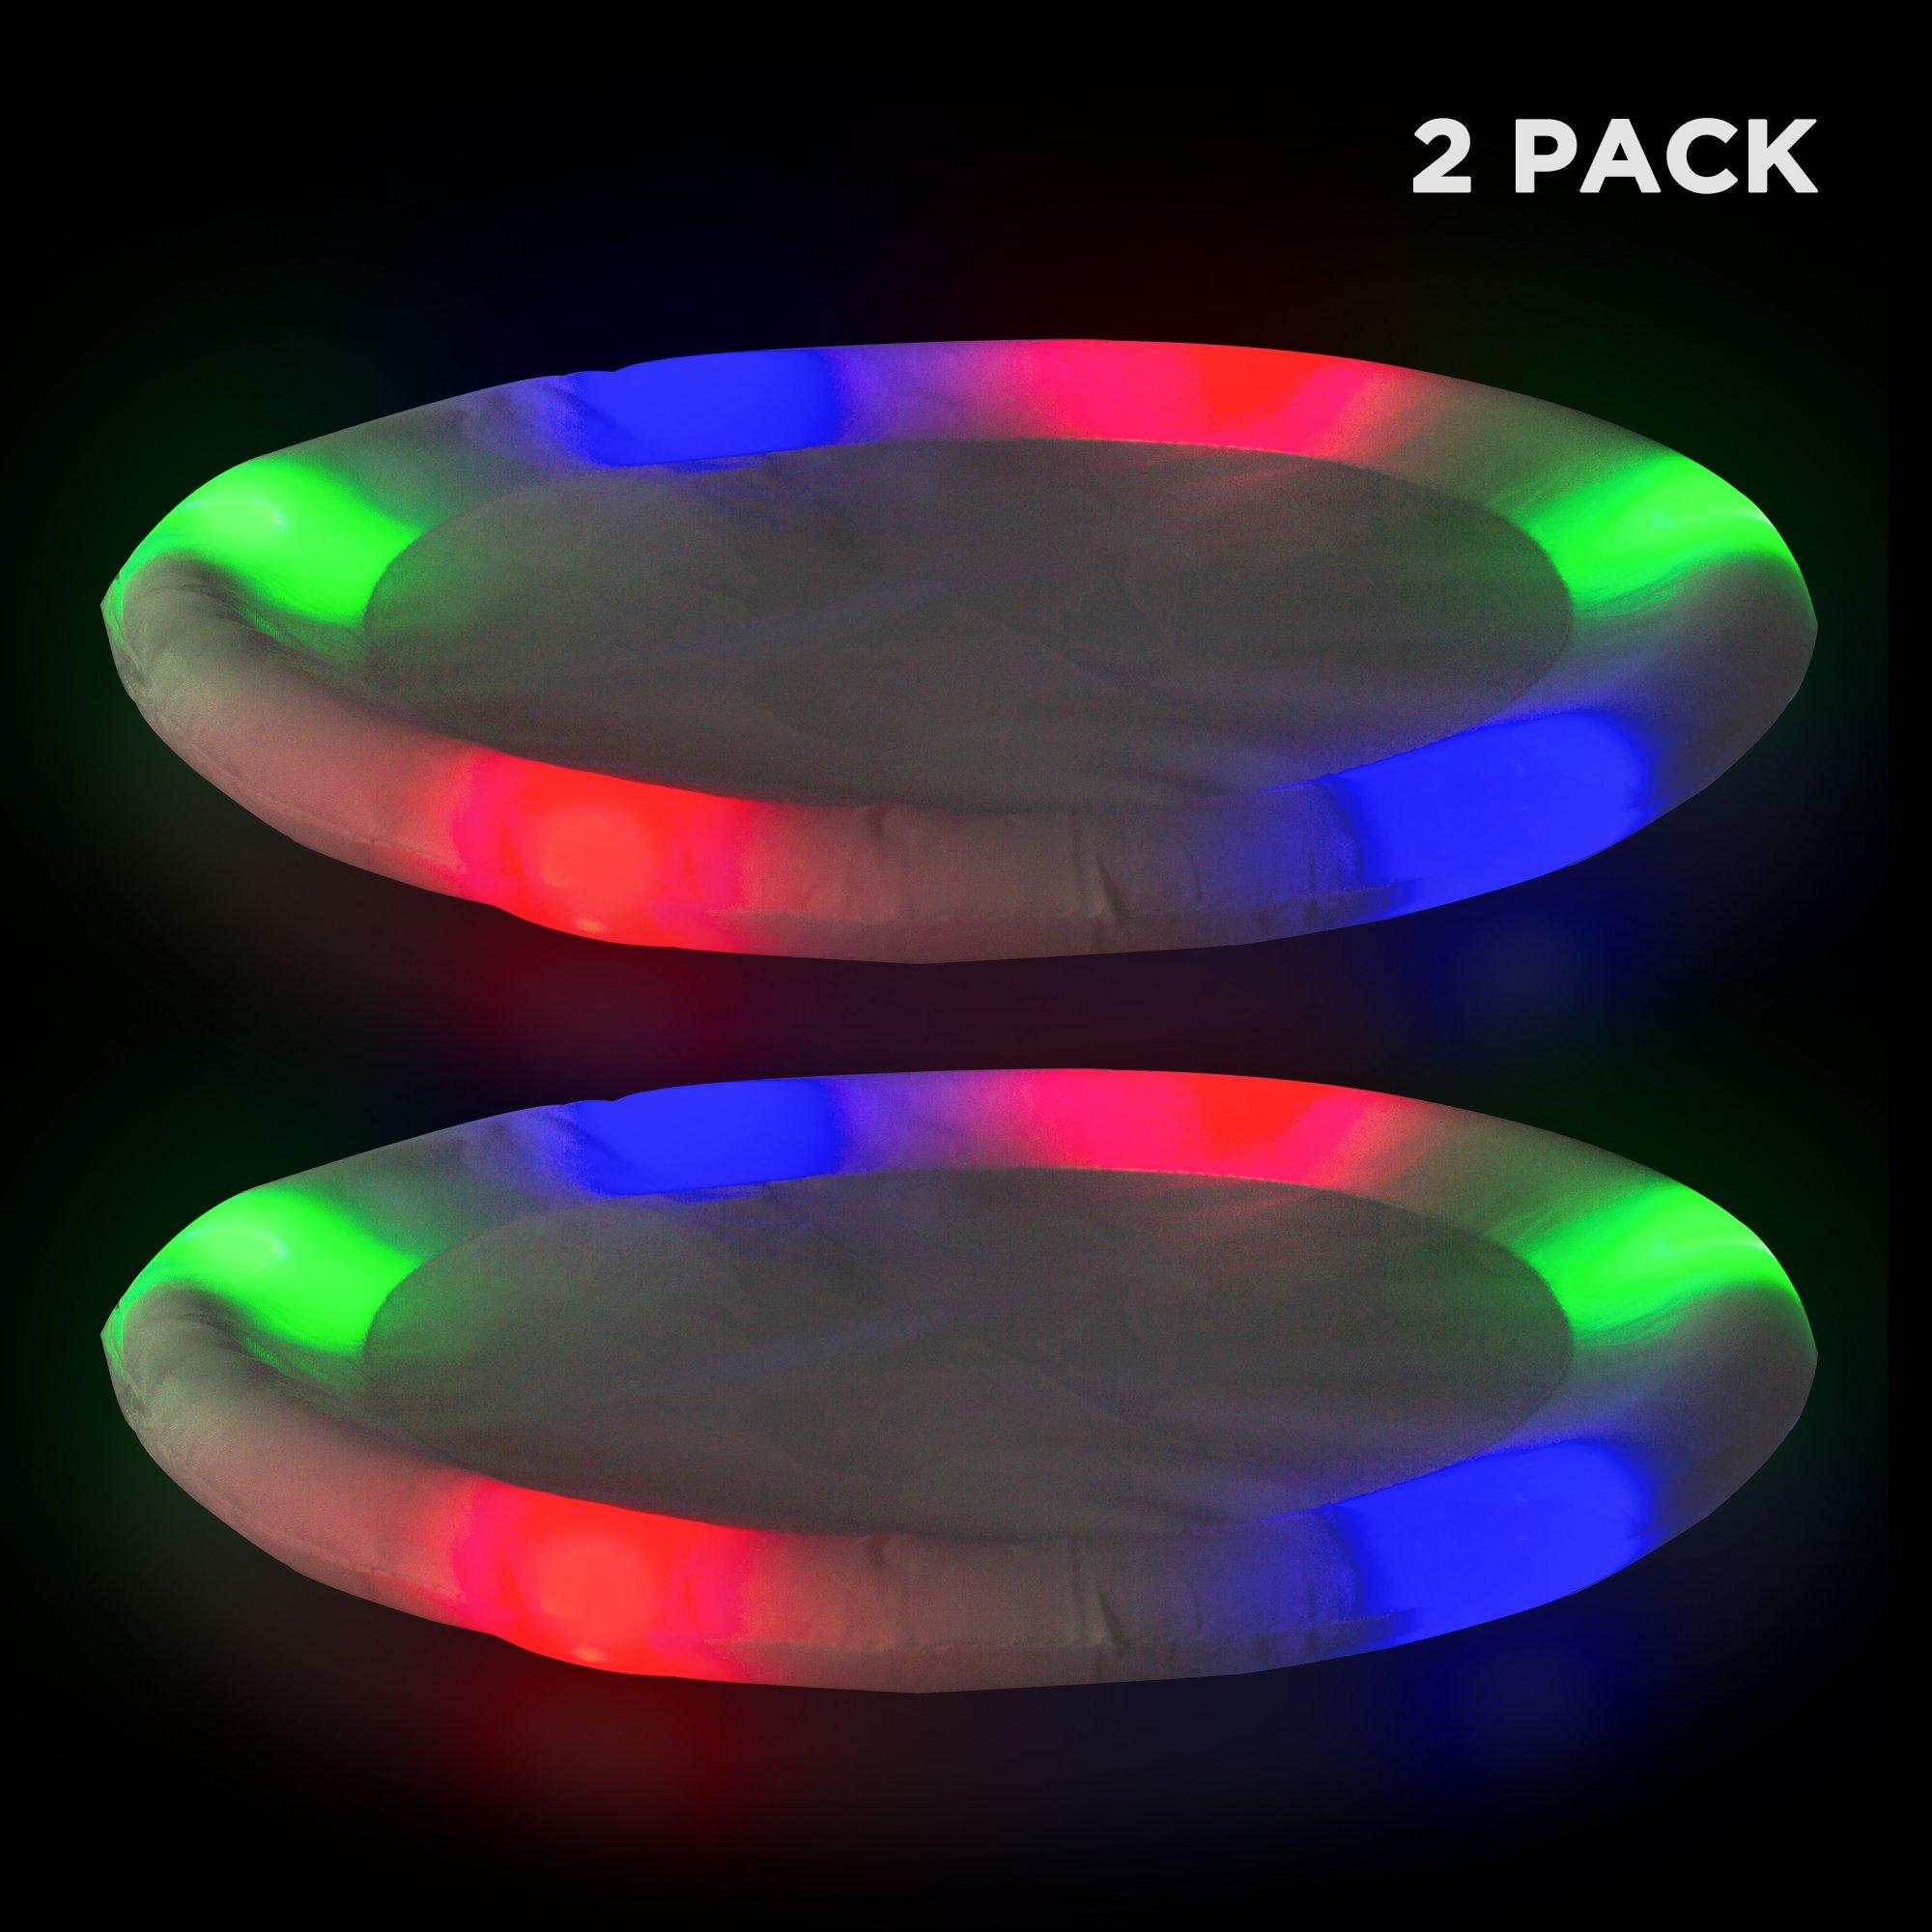 Windy City Novelties 2 Pack LED Flying Disc